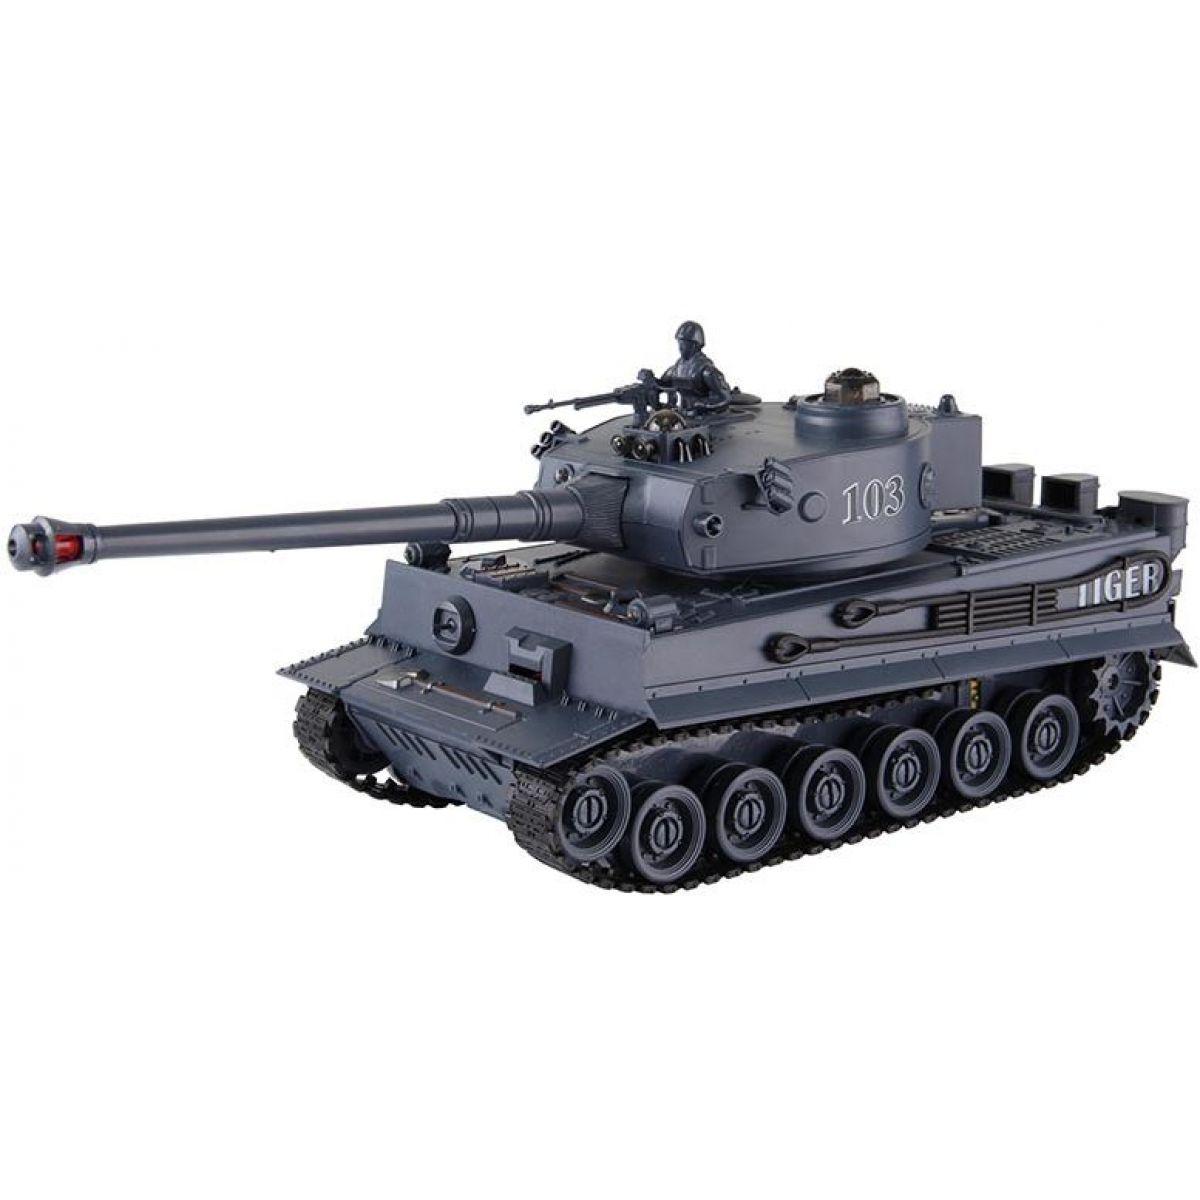 HM Studio FC Tank Tiger